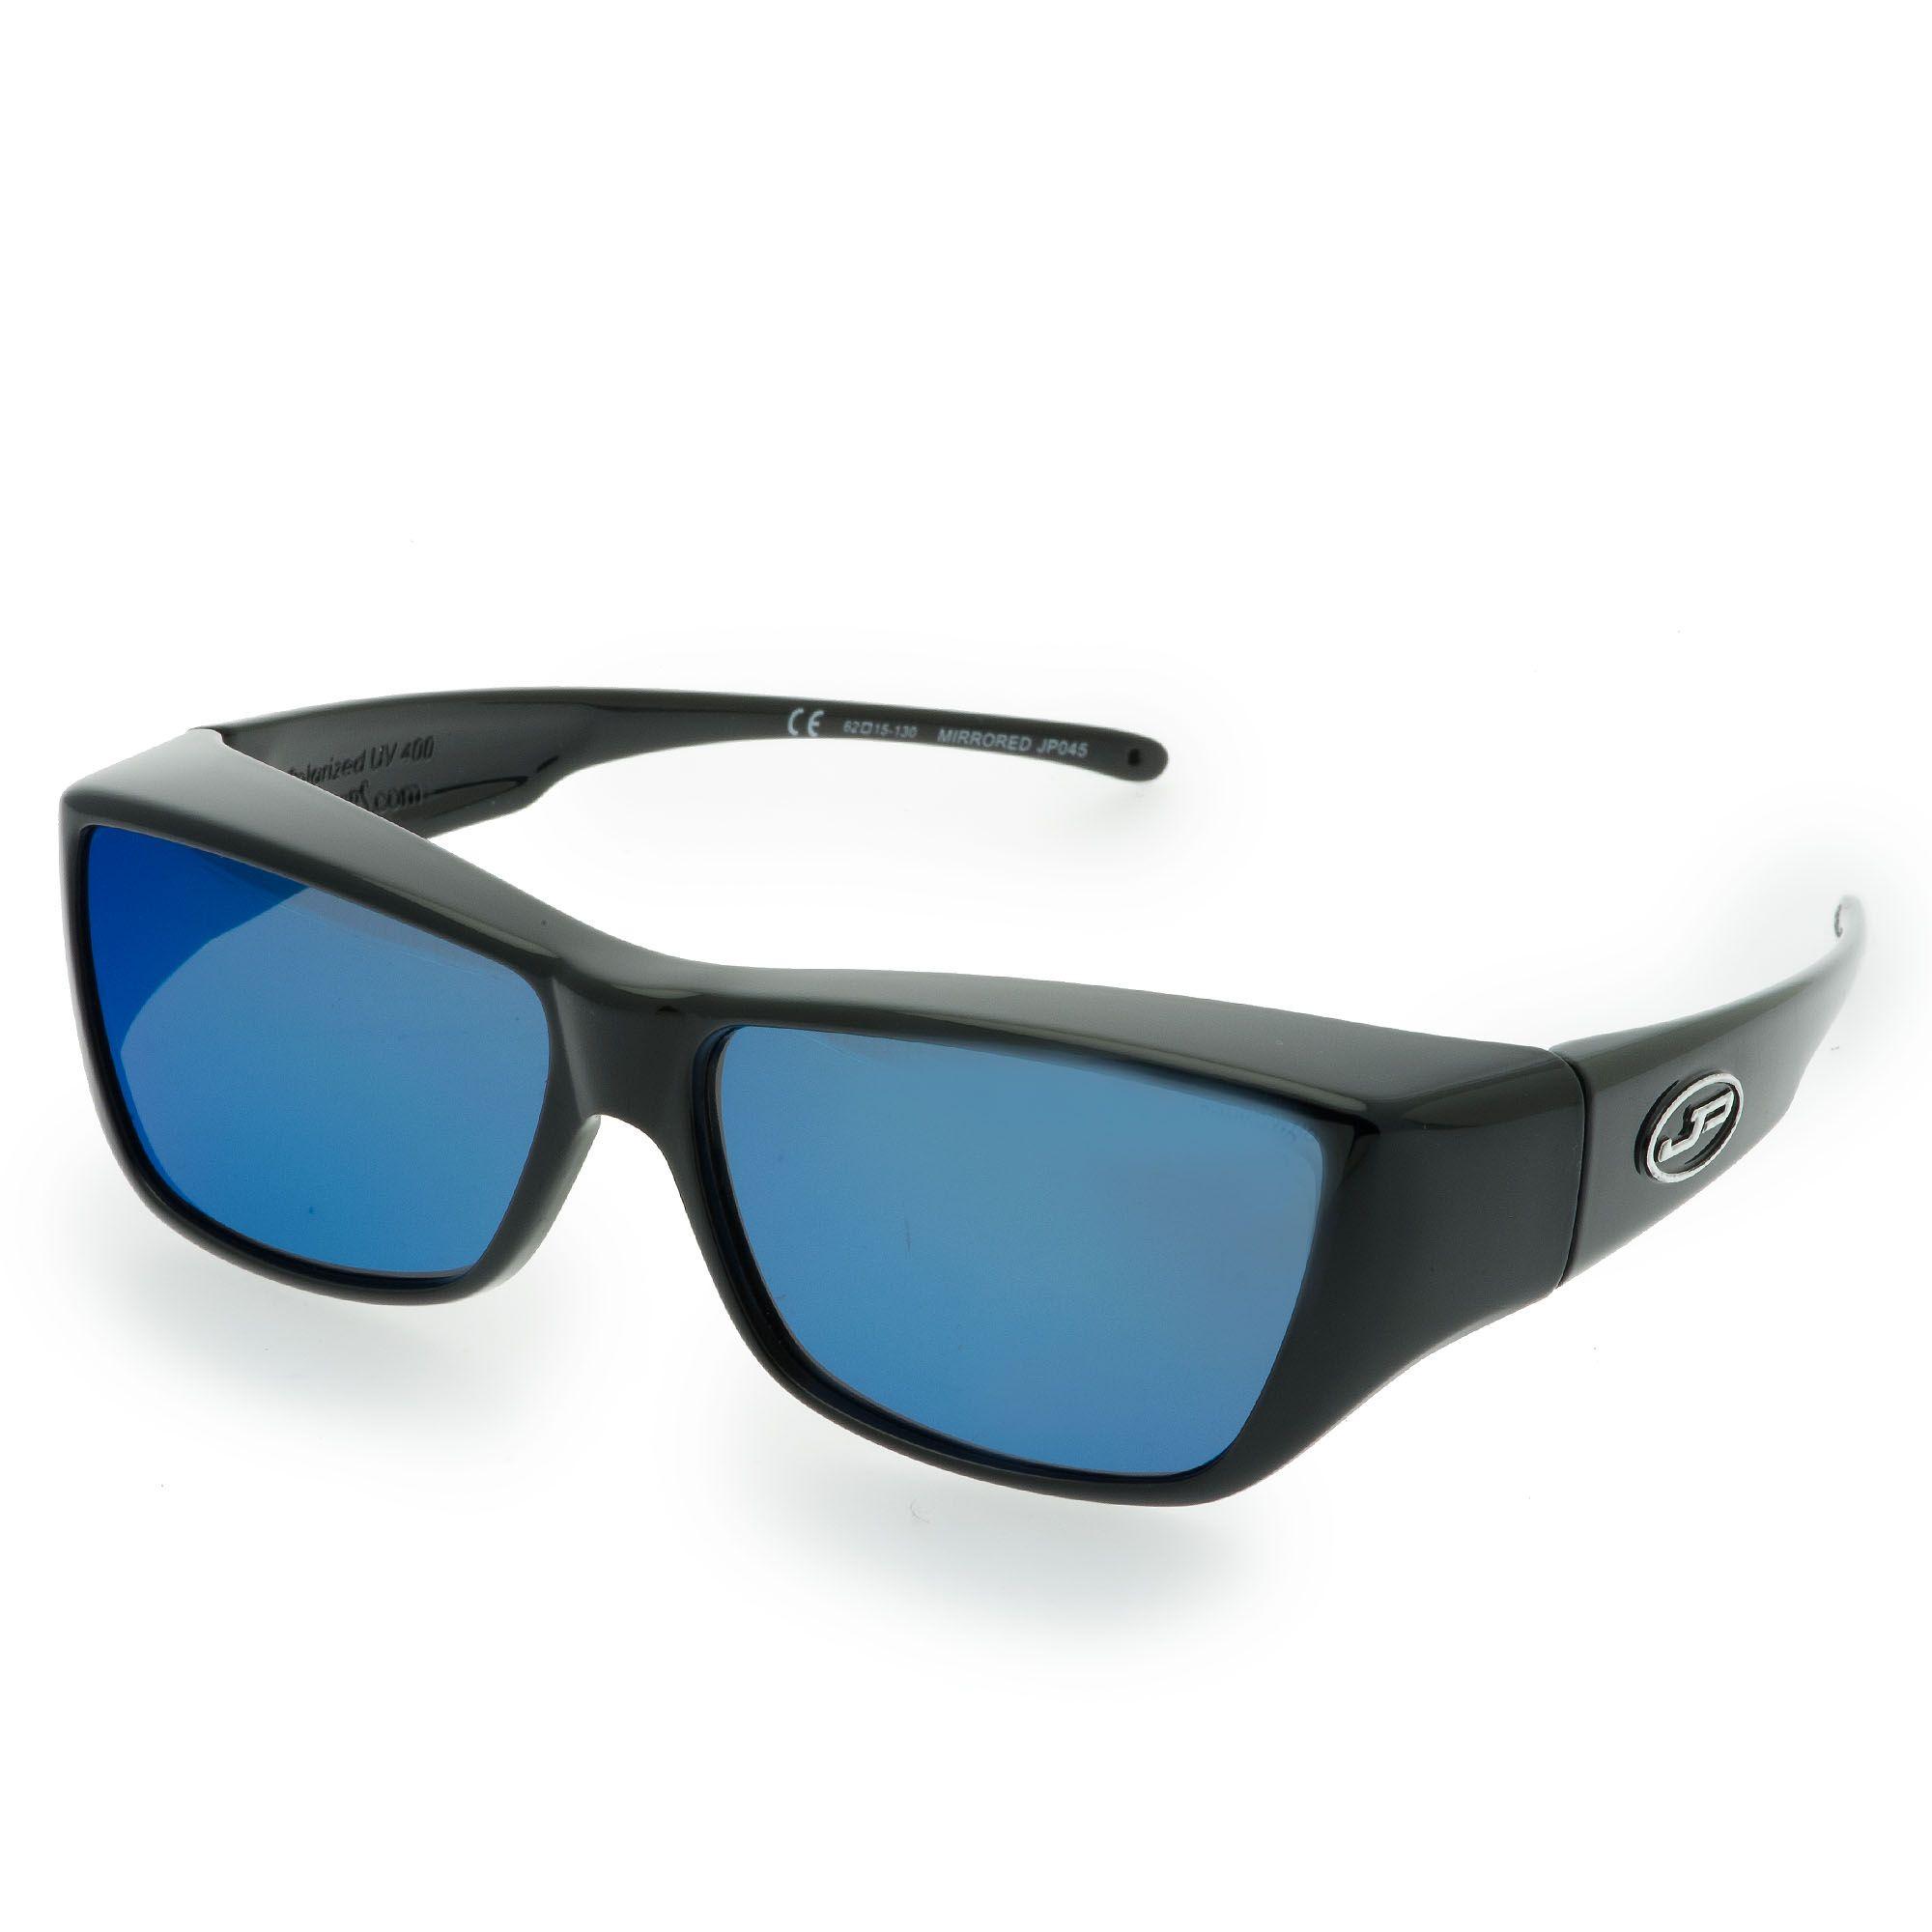 Image of Mirror Malibu occhiali sole indossabili su occhiali vista